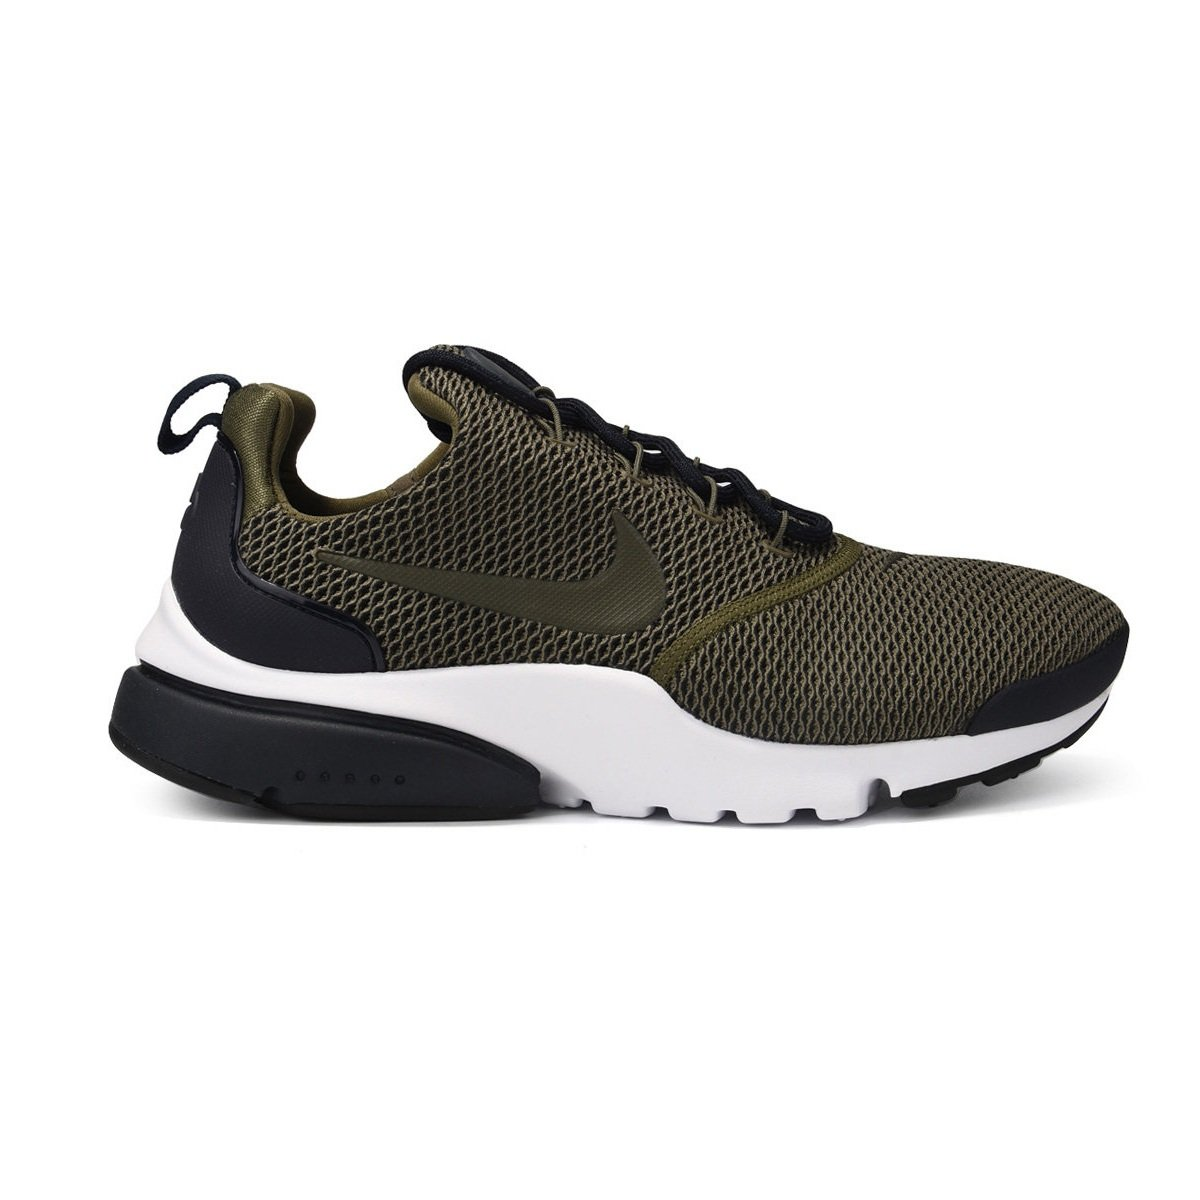 Nike Obsidian) KhakiDark OliveCargo (Medium US|Oliv D(M) 8